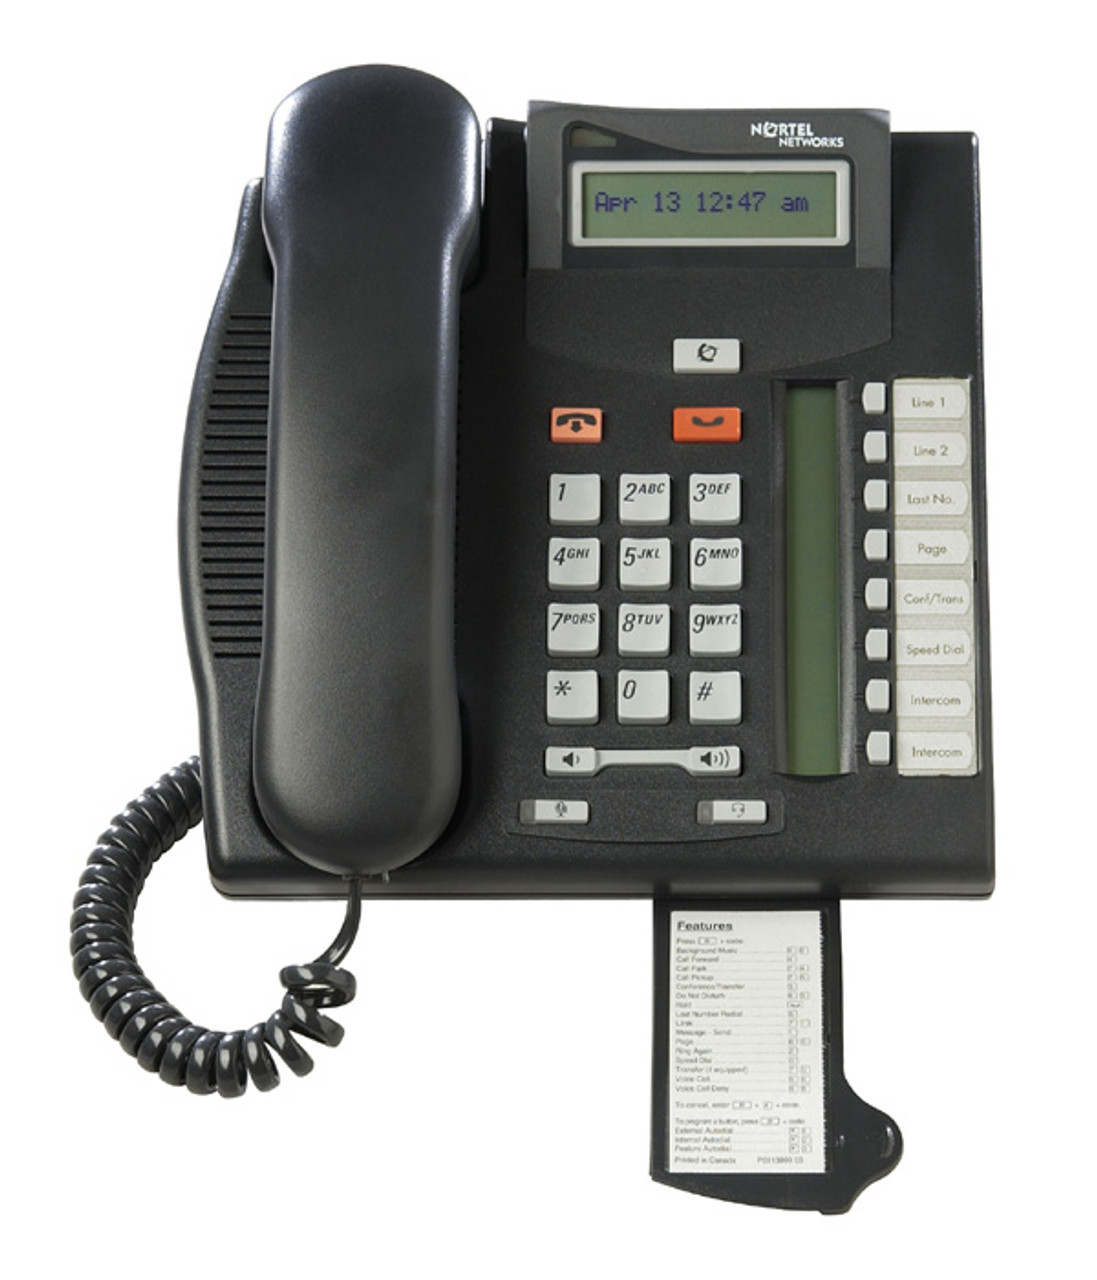 hight resolution of nortel norstar t7208 telephone